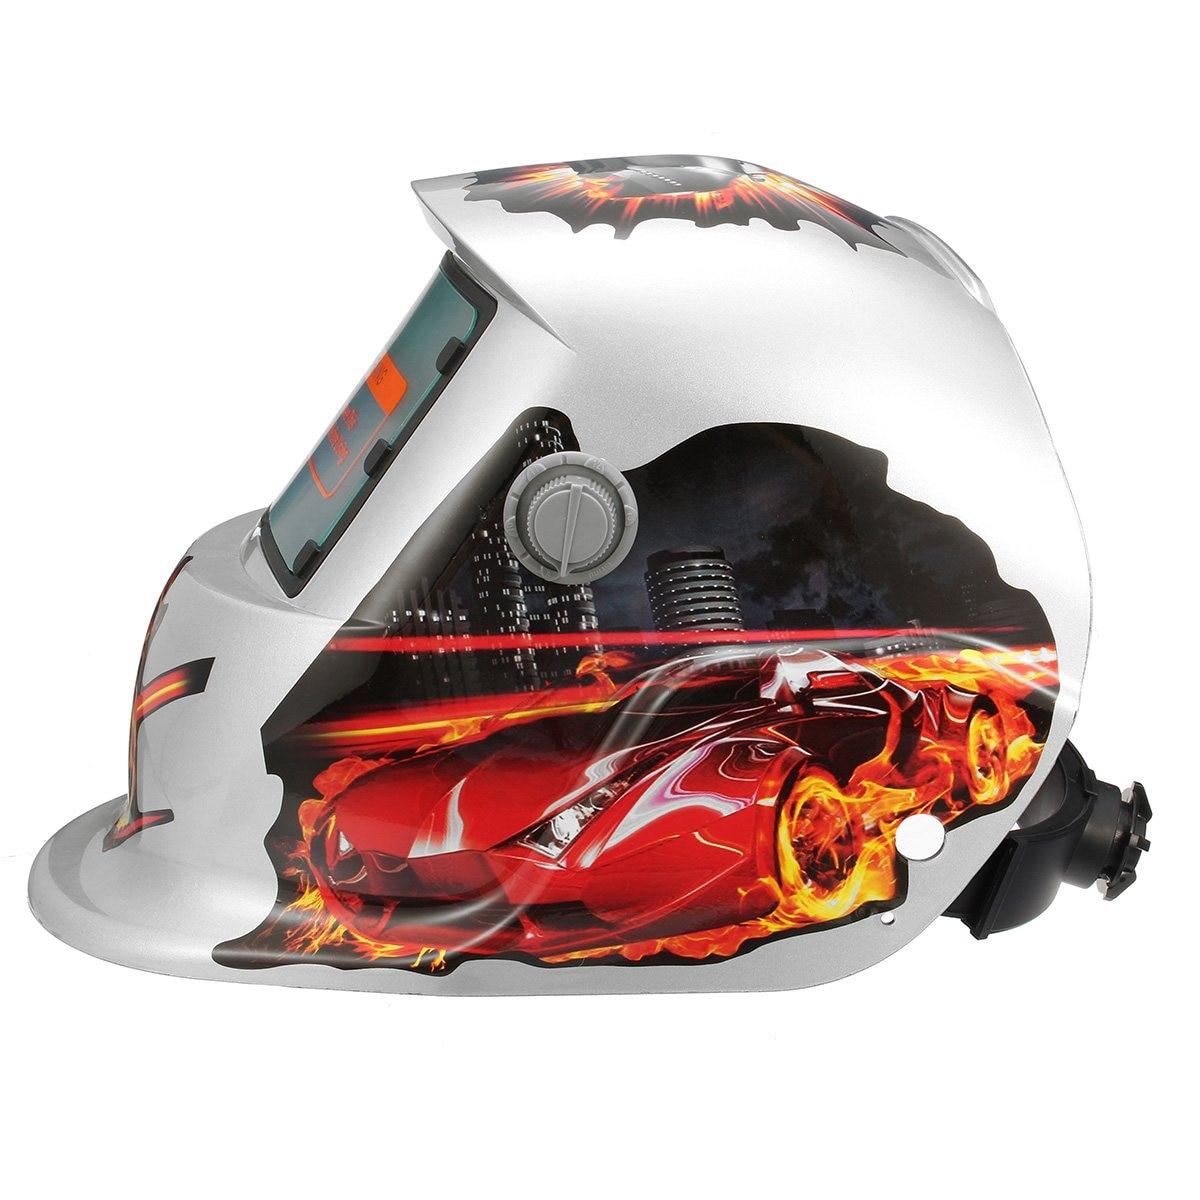 Hot sale Solar Auto Darkening Welding Welders Helmet Tig Mask Grinding Welder Masks cnim hot auto darkening welding helmet